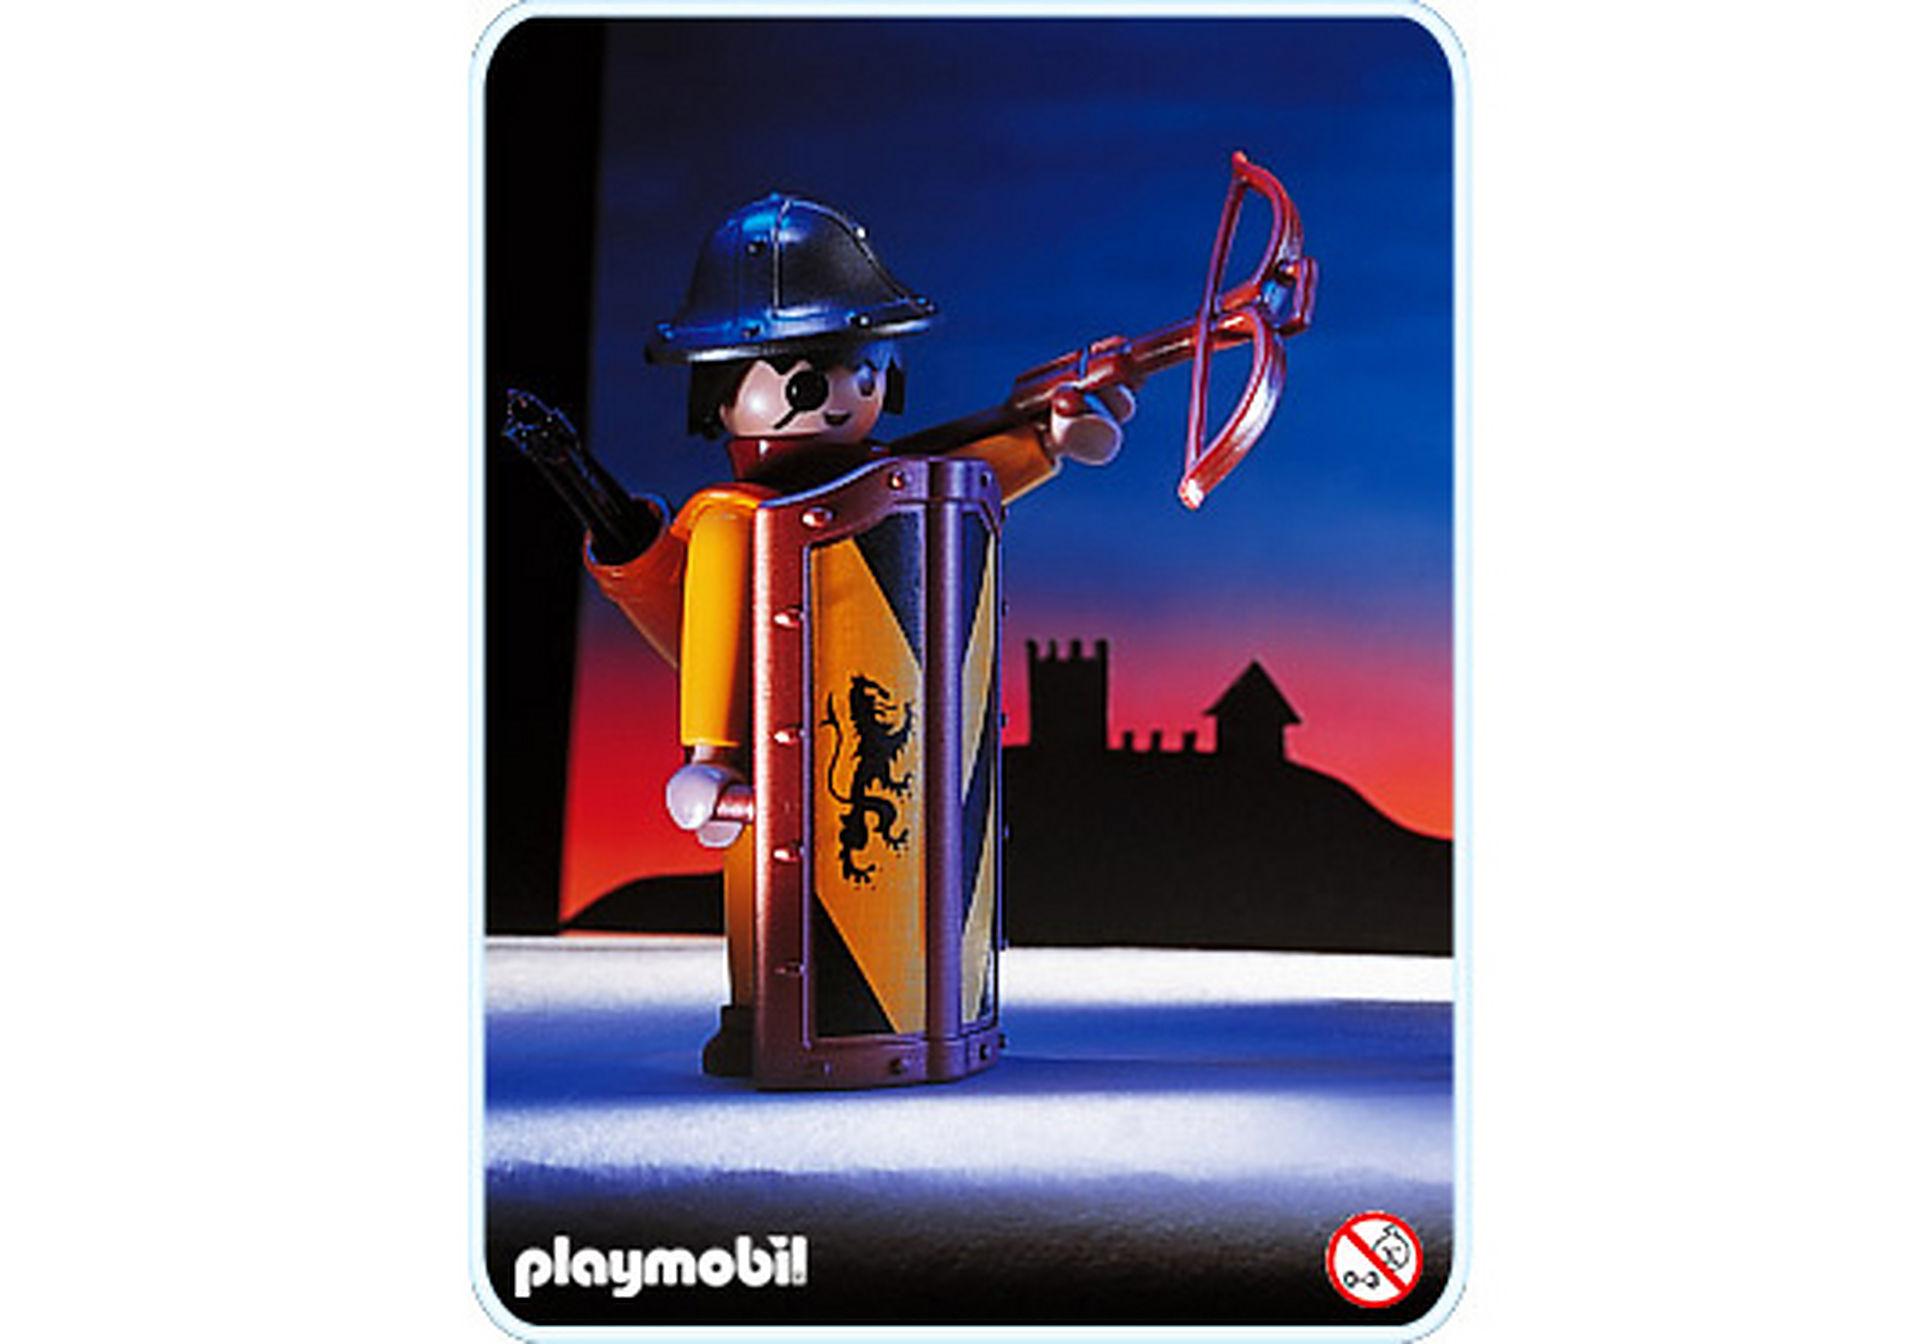 http://media.playmobil.com/i/playmobil/3651-A_product_detail/Armbrustschütze